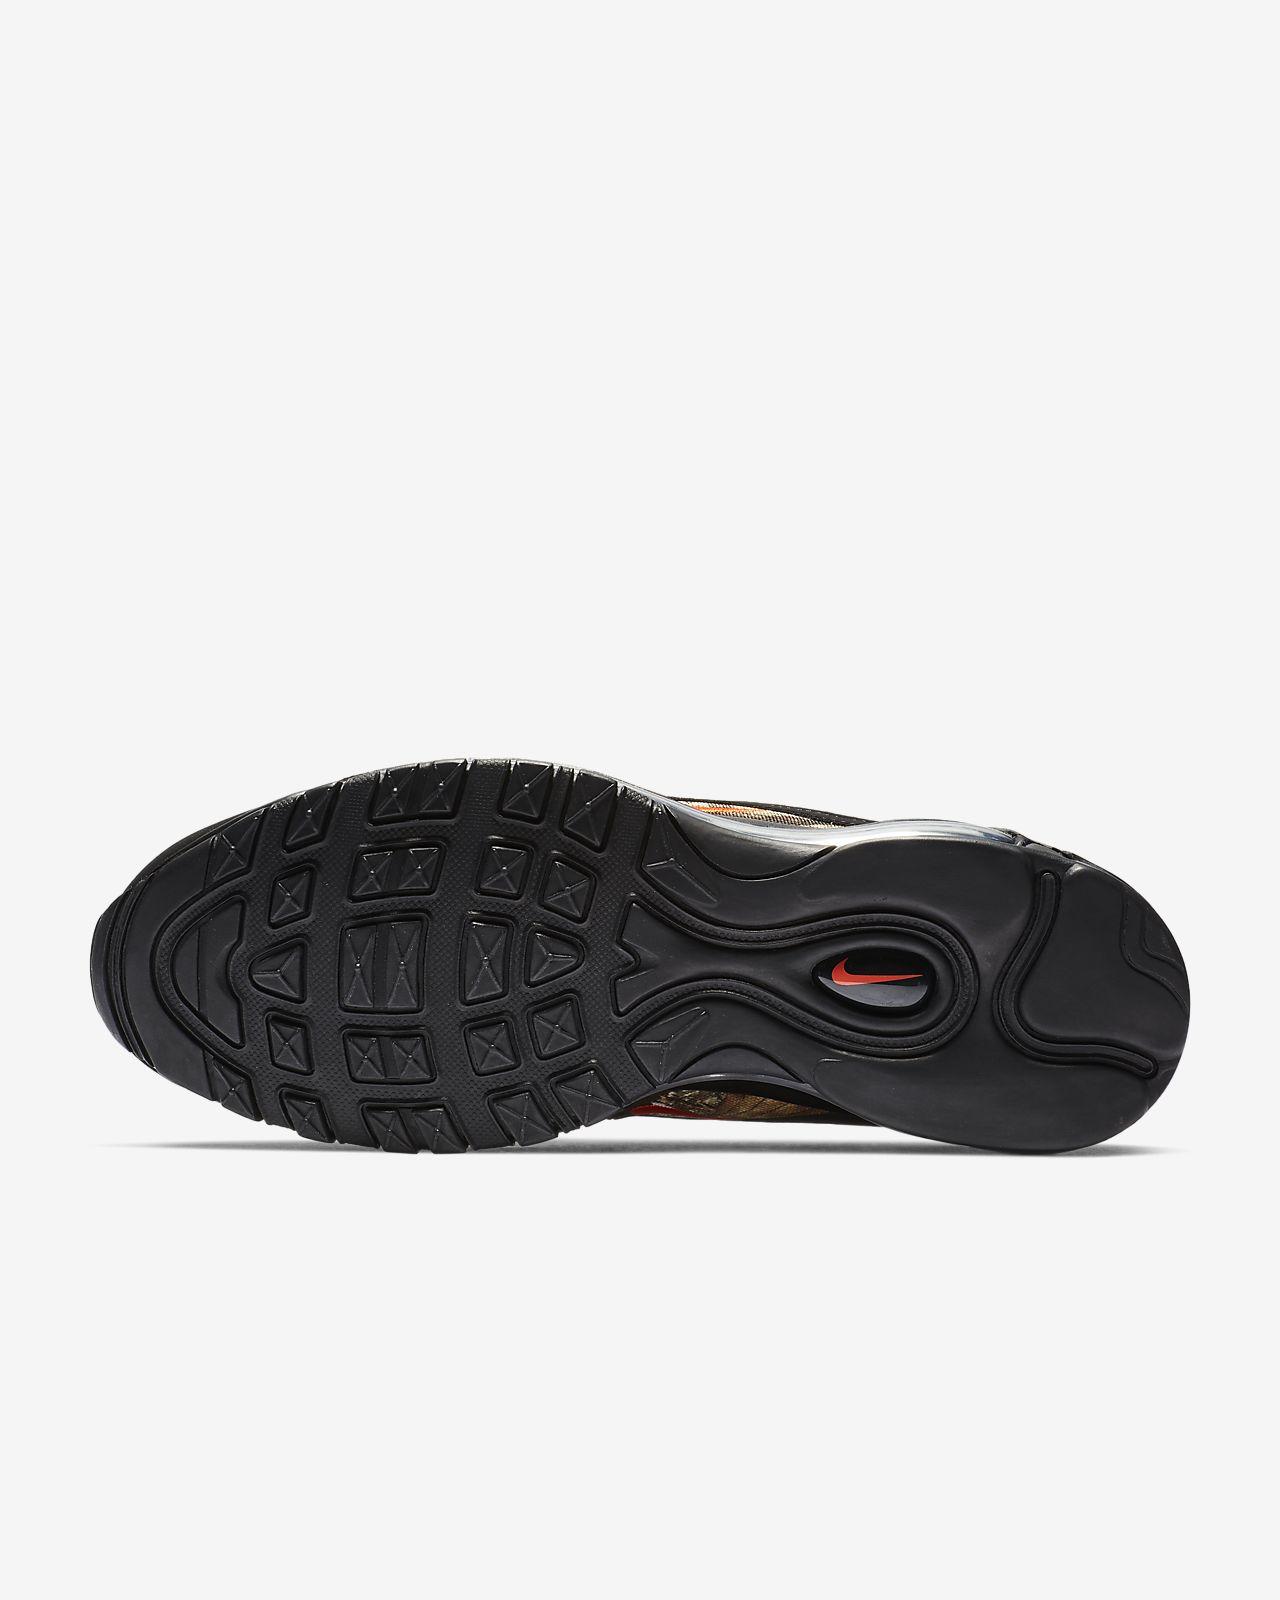 f388e5c5ec816 Nike Air Max 97 Realtree® Men's Shoe. Nike.com